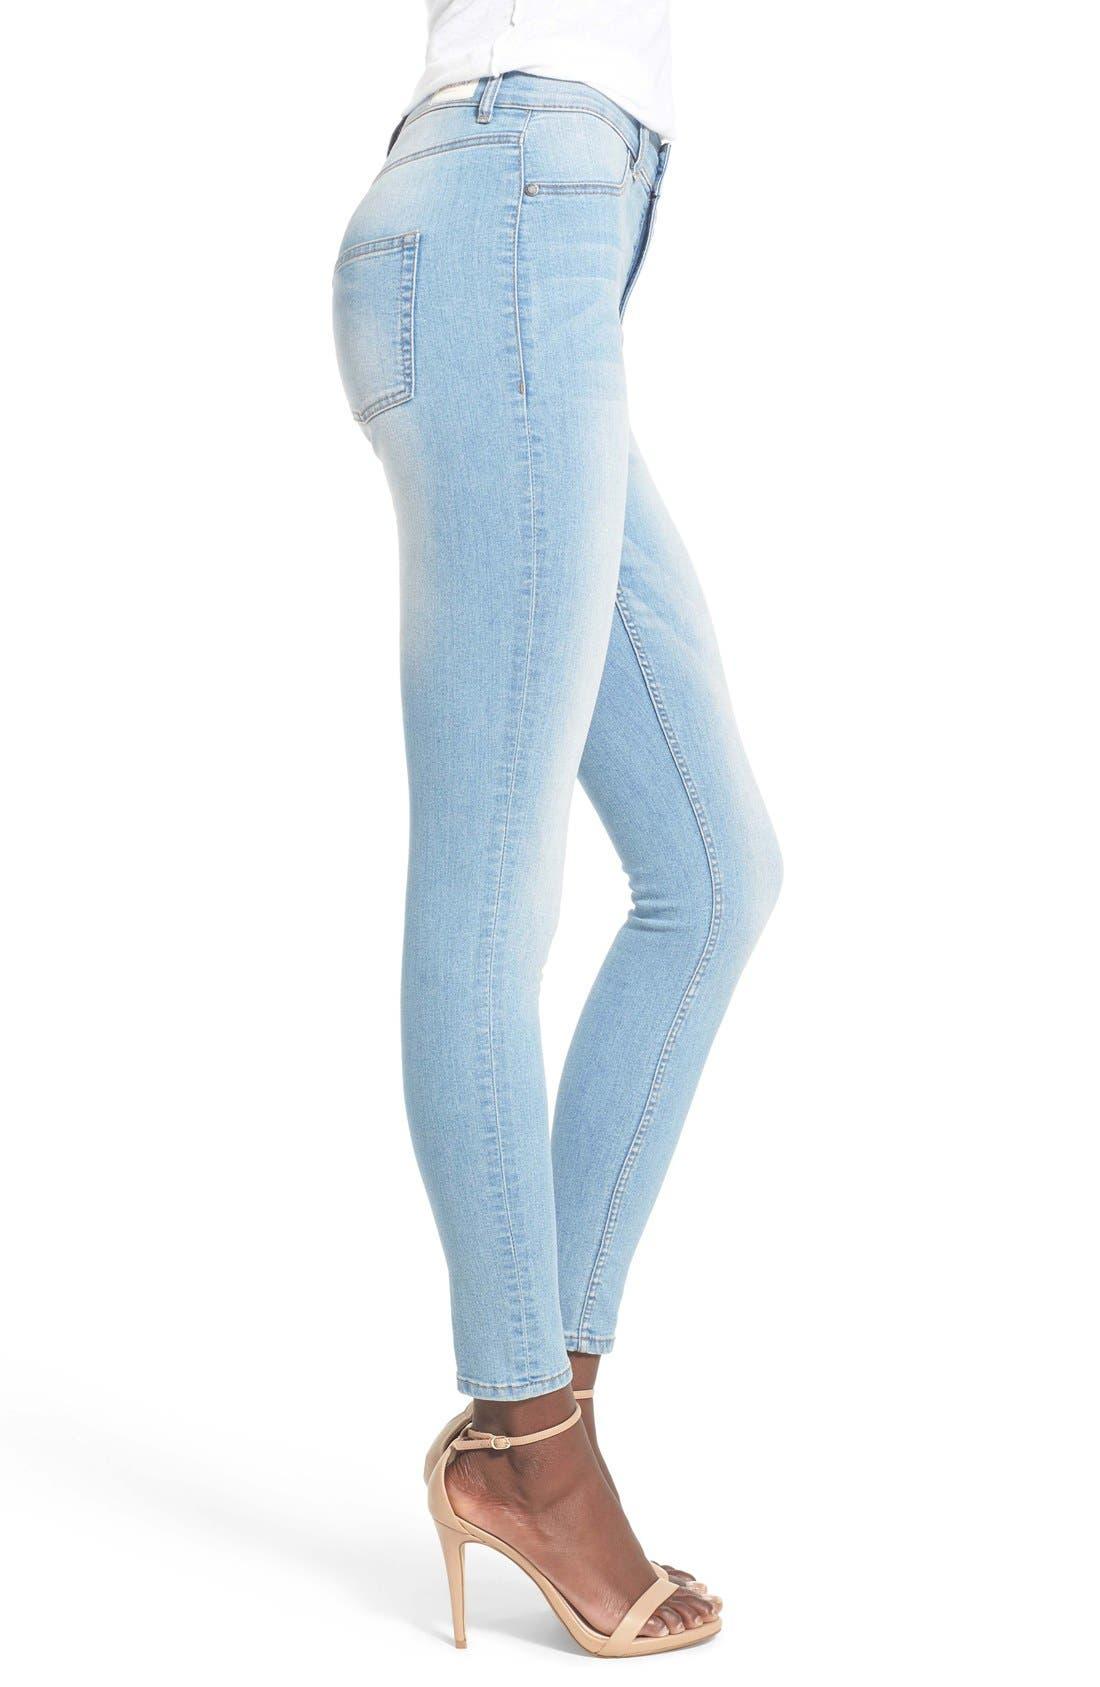 Alternate Image 3  - Cheap Monday 'High Spray' High Rise Skinny Jeans (Stone Bleach)